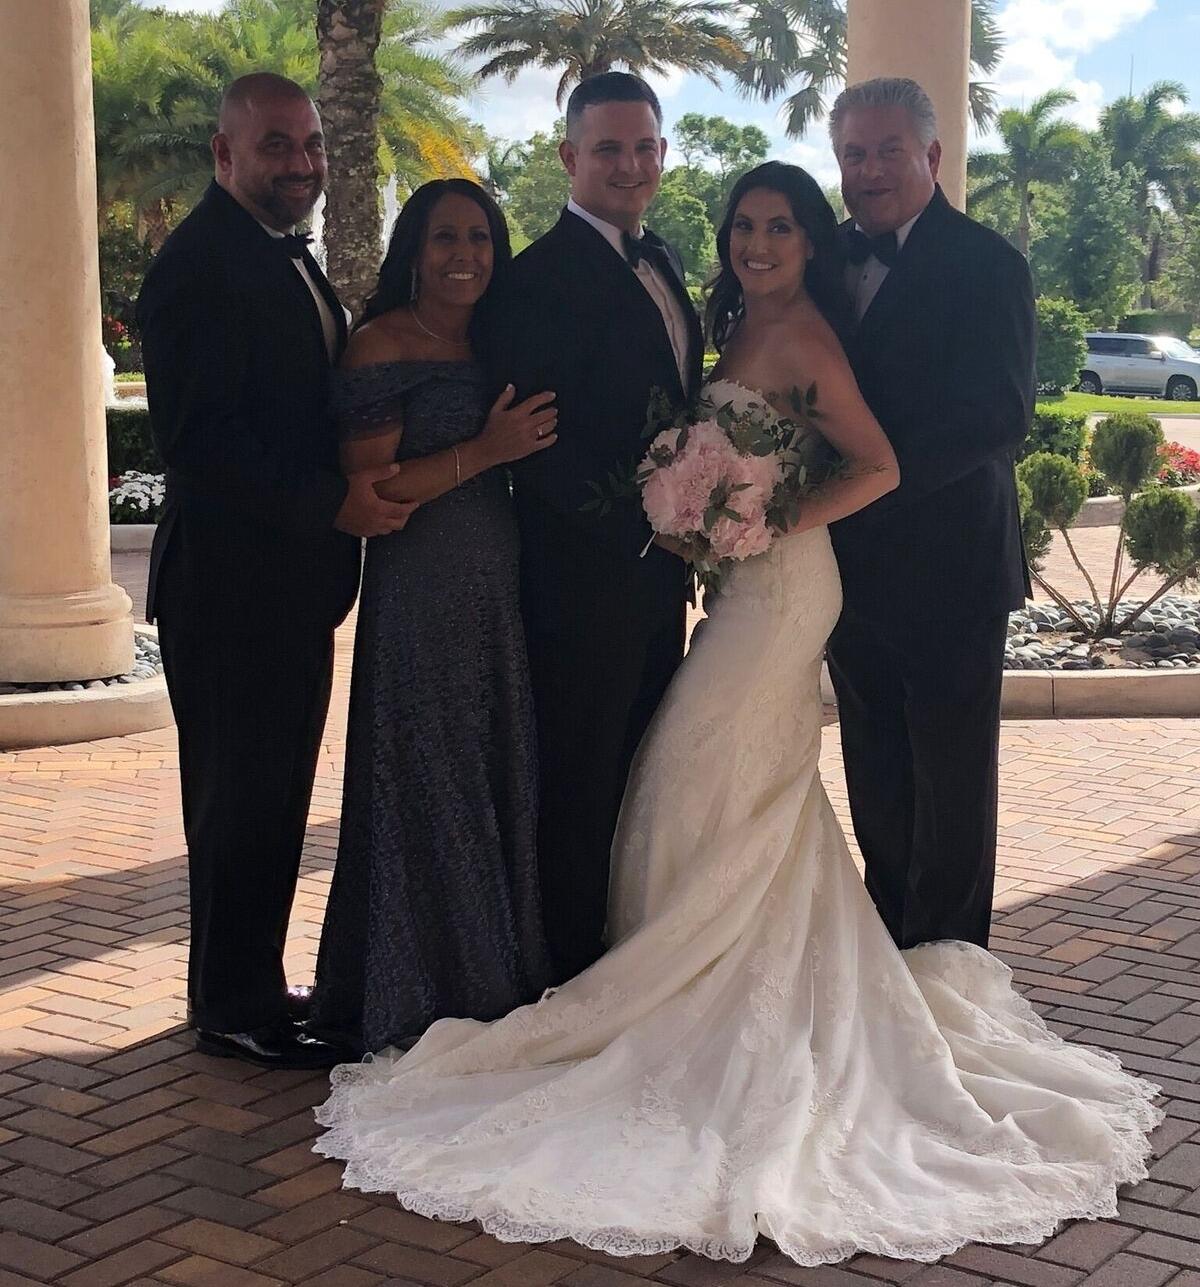 Jason, Ellen, Geoff, Jenni and Chas